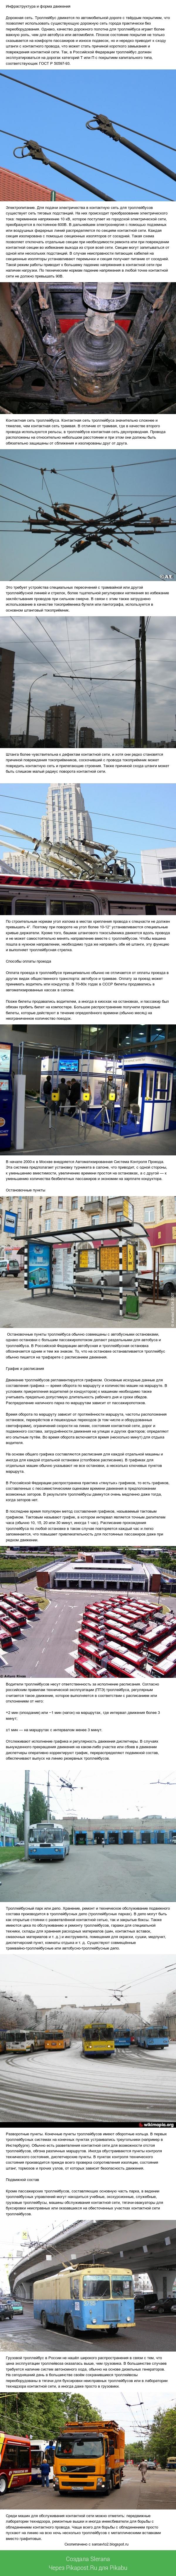 Все о троллейбусе (Часть 4) Копипаста, Троллейбус, Длиннопост